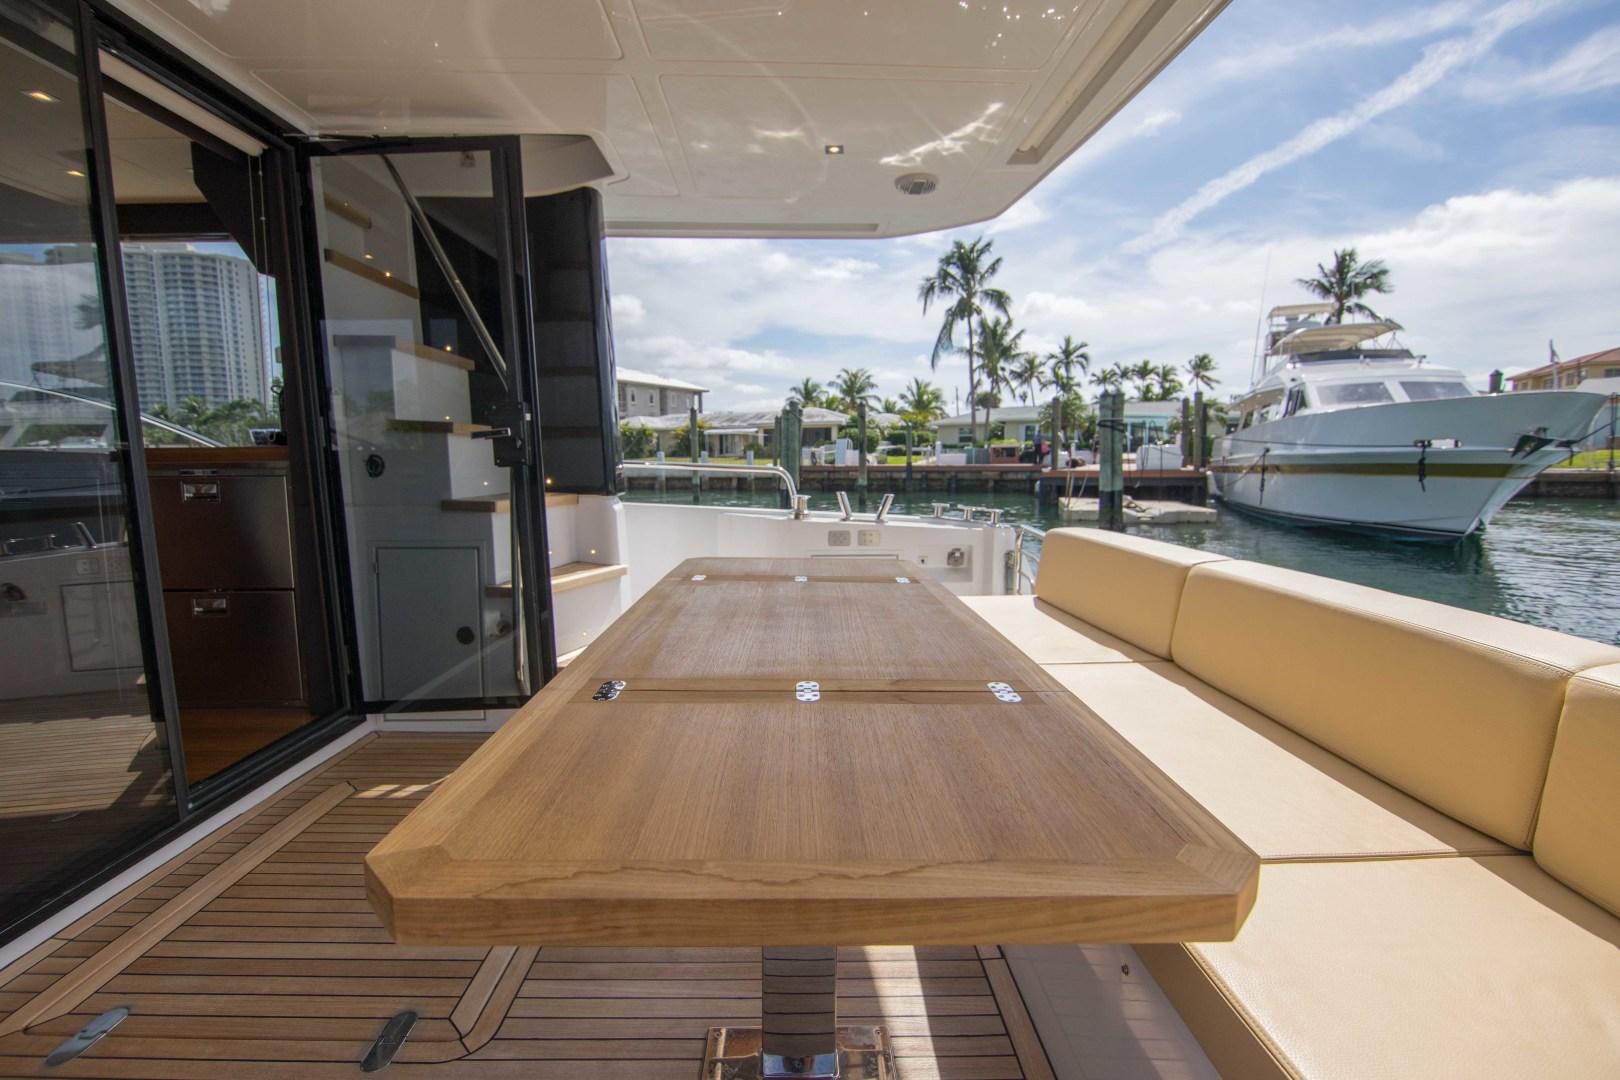 Sundeck-58 Sport 2019-LJ IV Singer Island-Florida-United States-Aft Deck-1373068 | Thumbnail